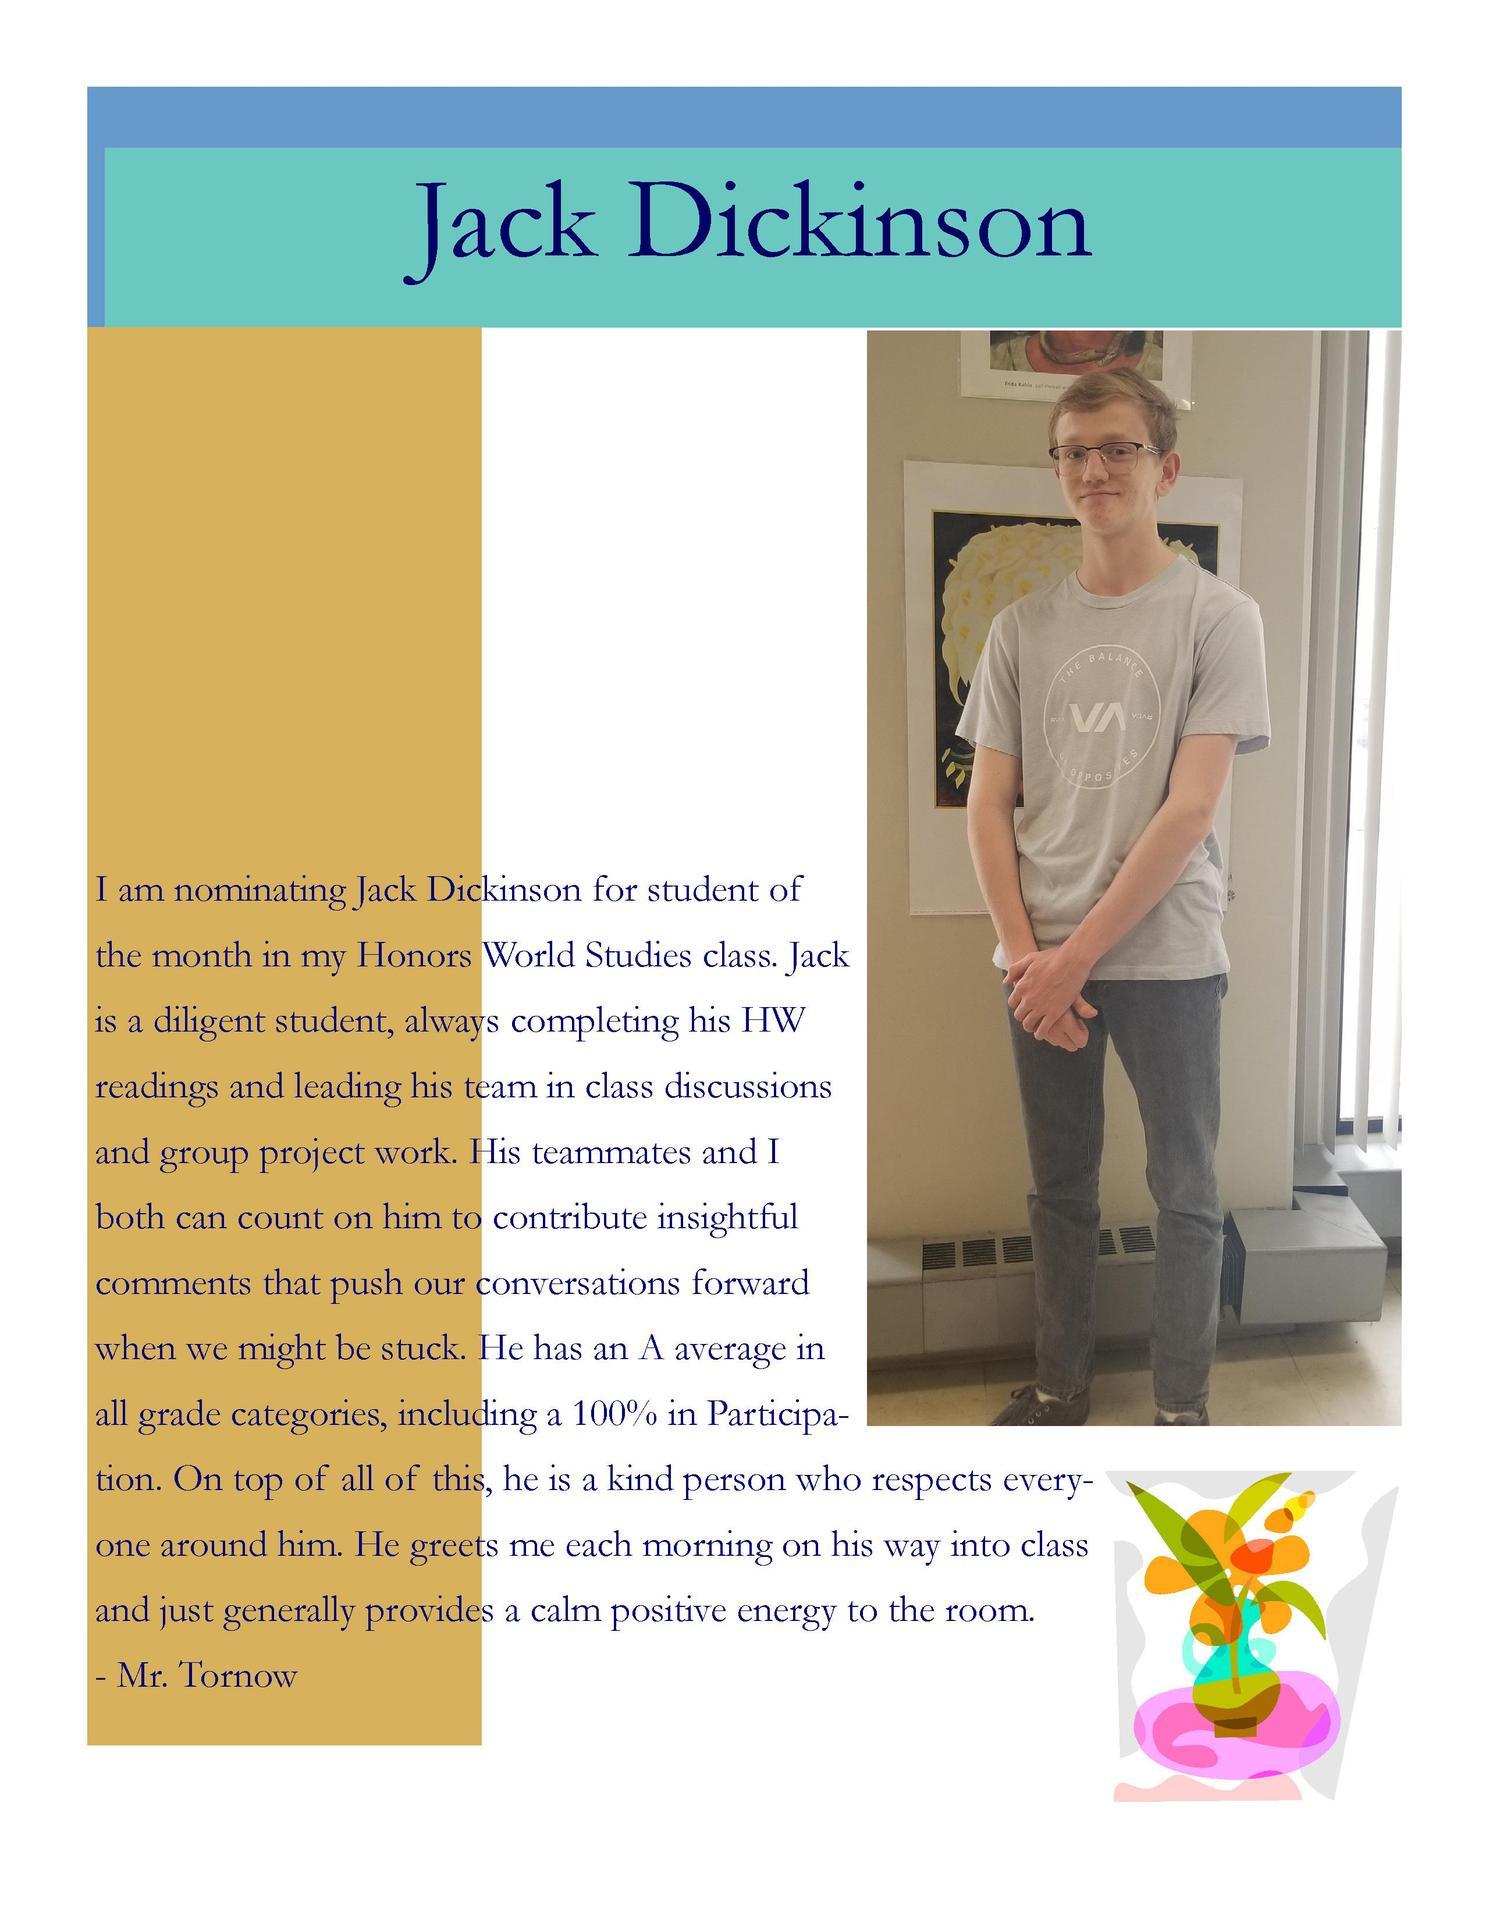 Image of Jack Dickinson